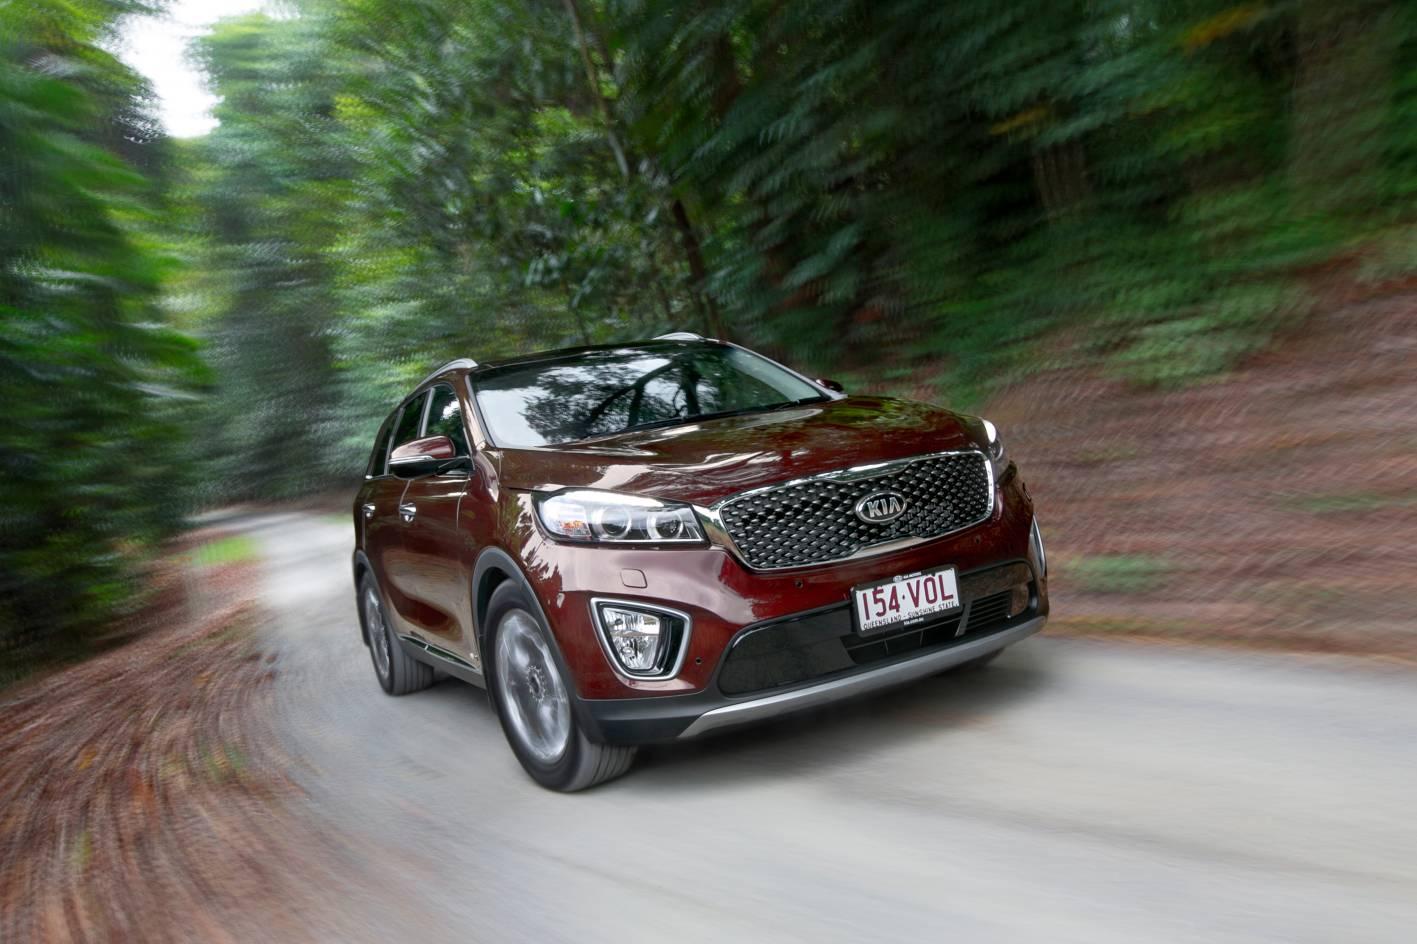 tech expert sorrento drive kia sorento cars reviews review kx